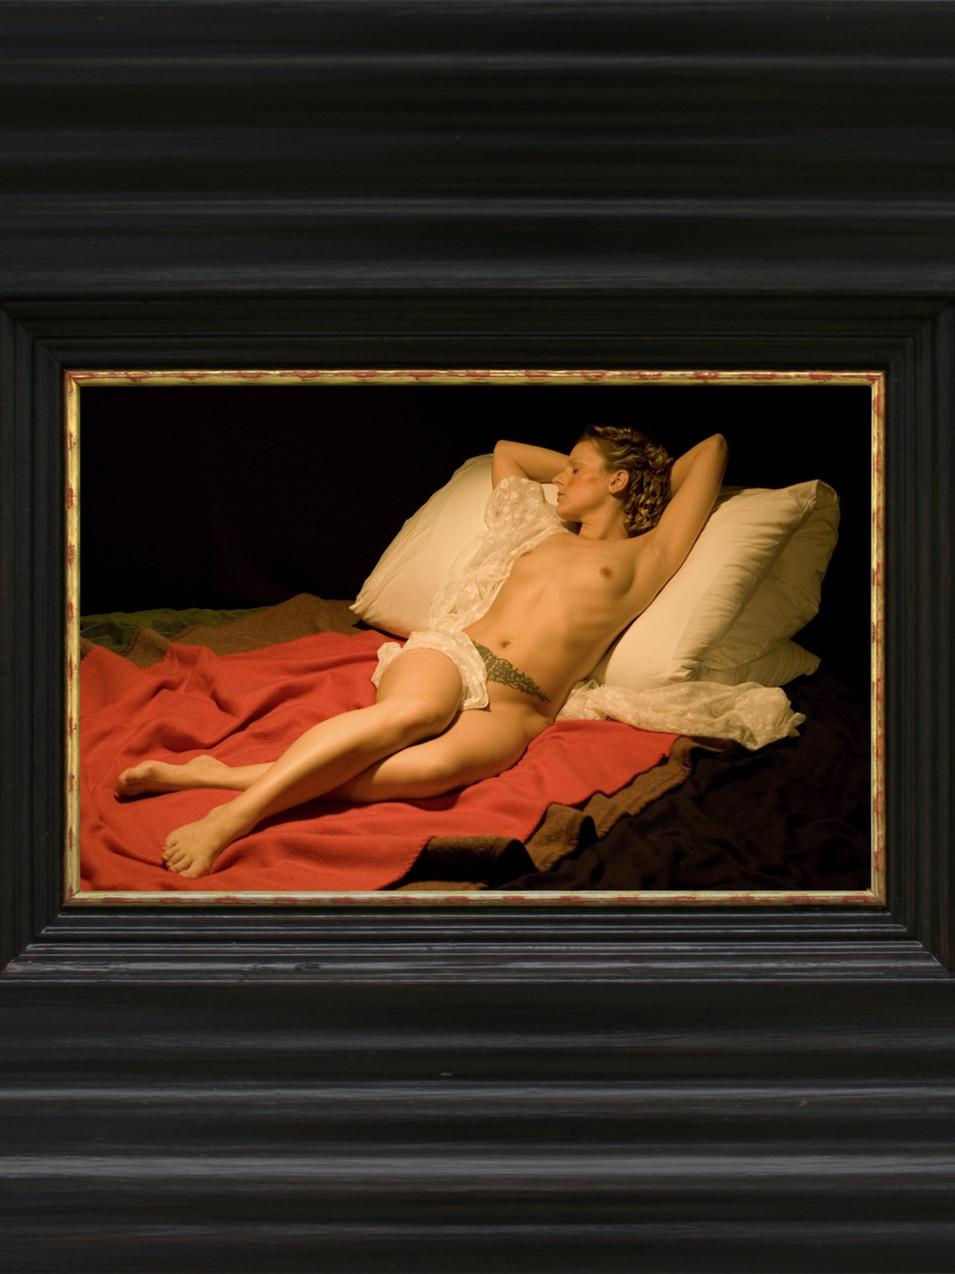 Anna Herrgott | Feat. Rubens - Sylvi as Angelika m.R. | 2008 | Fotografie | 32 cm x 38 cm Auflage 8